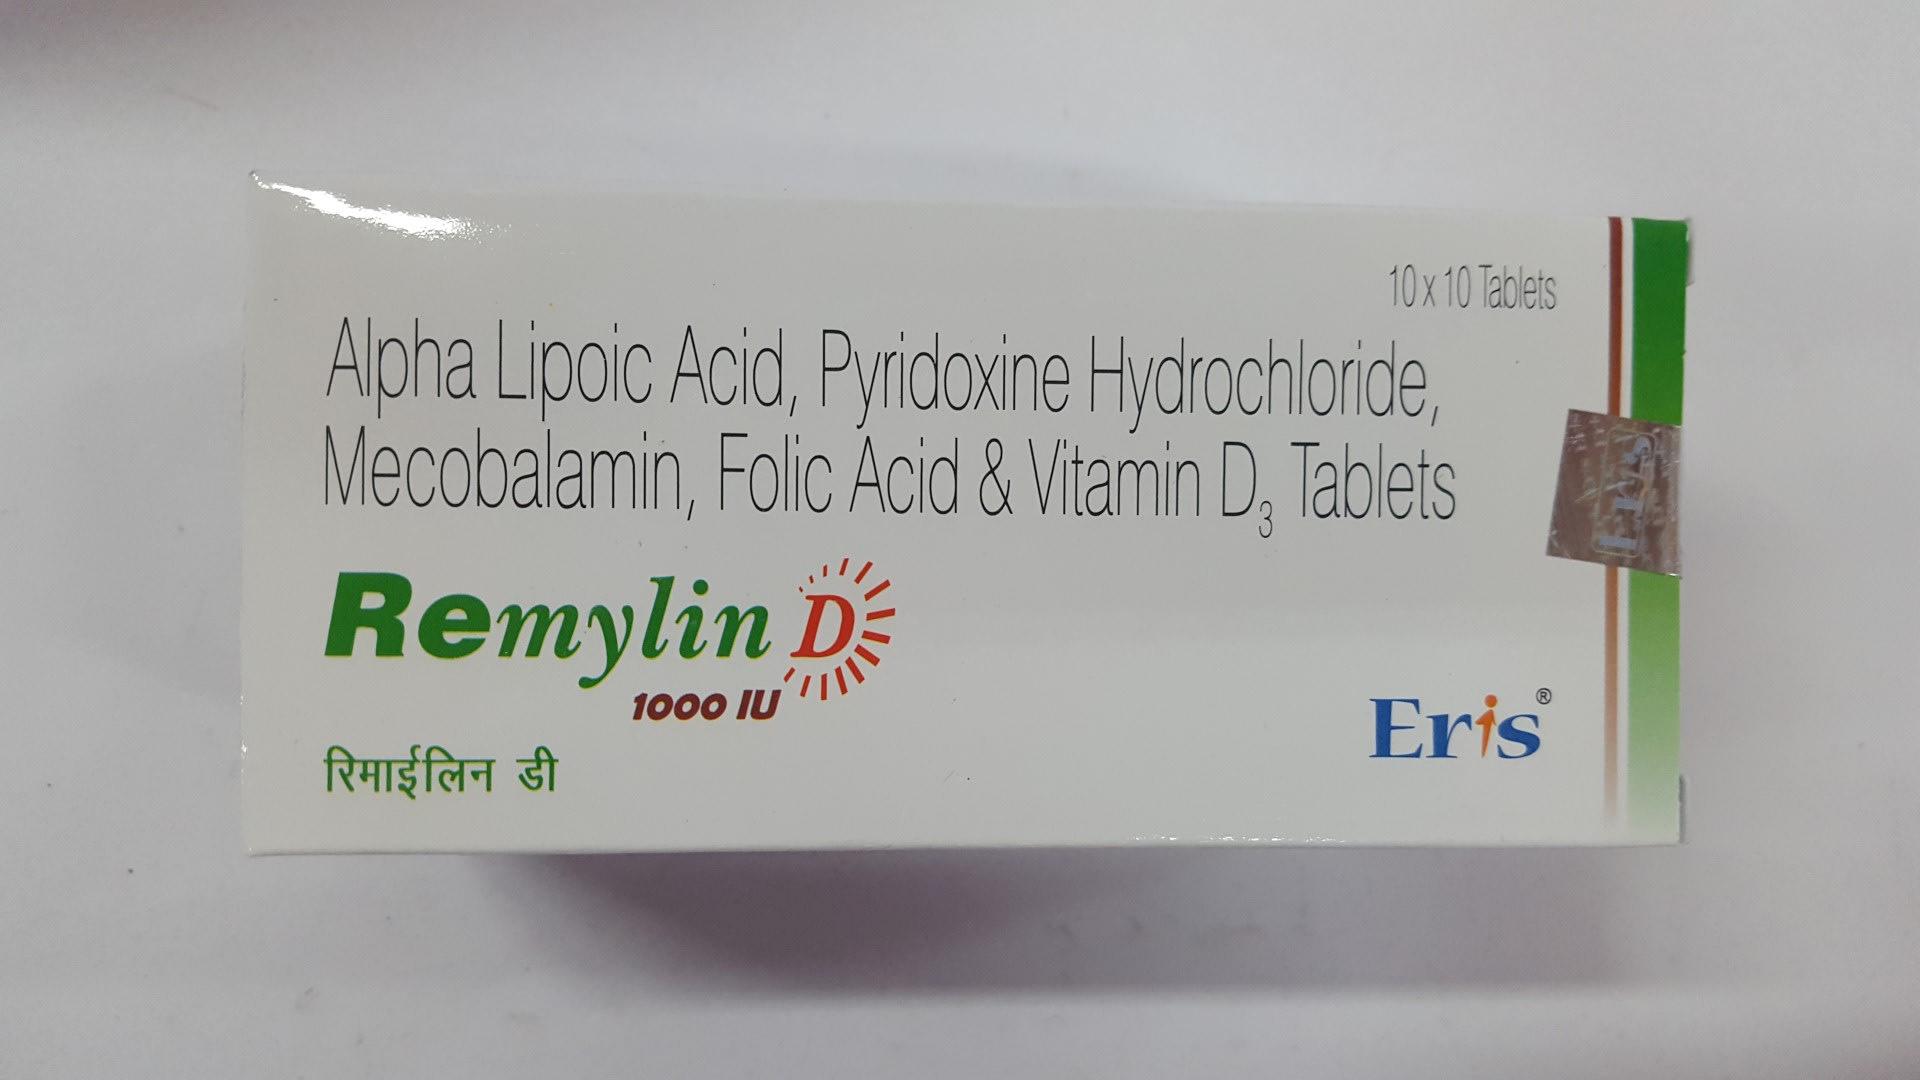 Remylin D Tablet